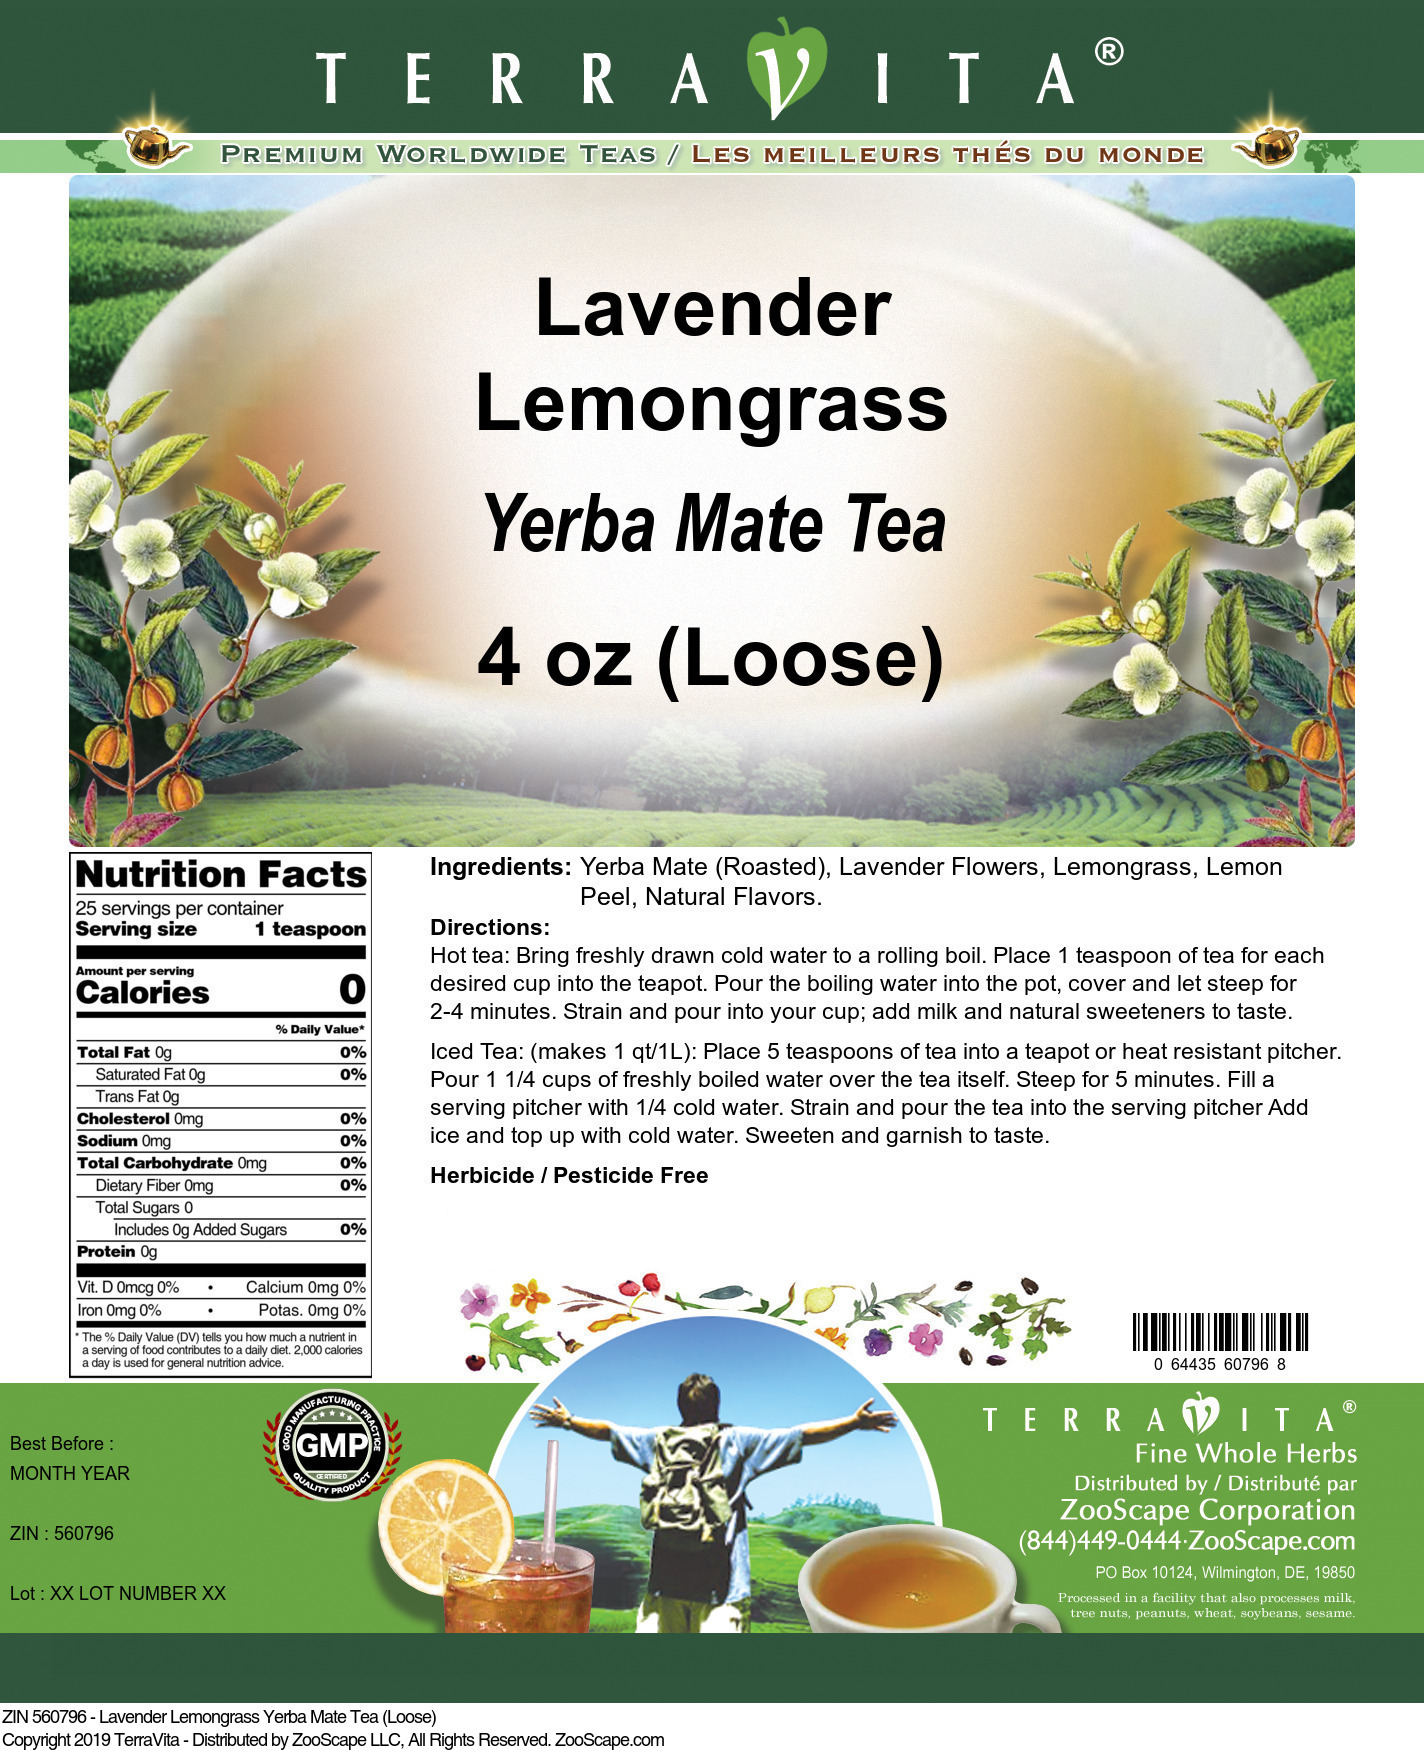 Lavender Lemongrass Yerba Mate Tea (Loose)